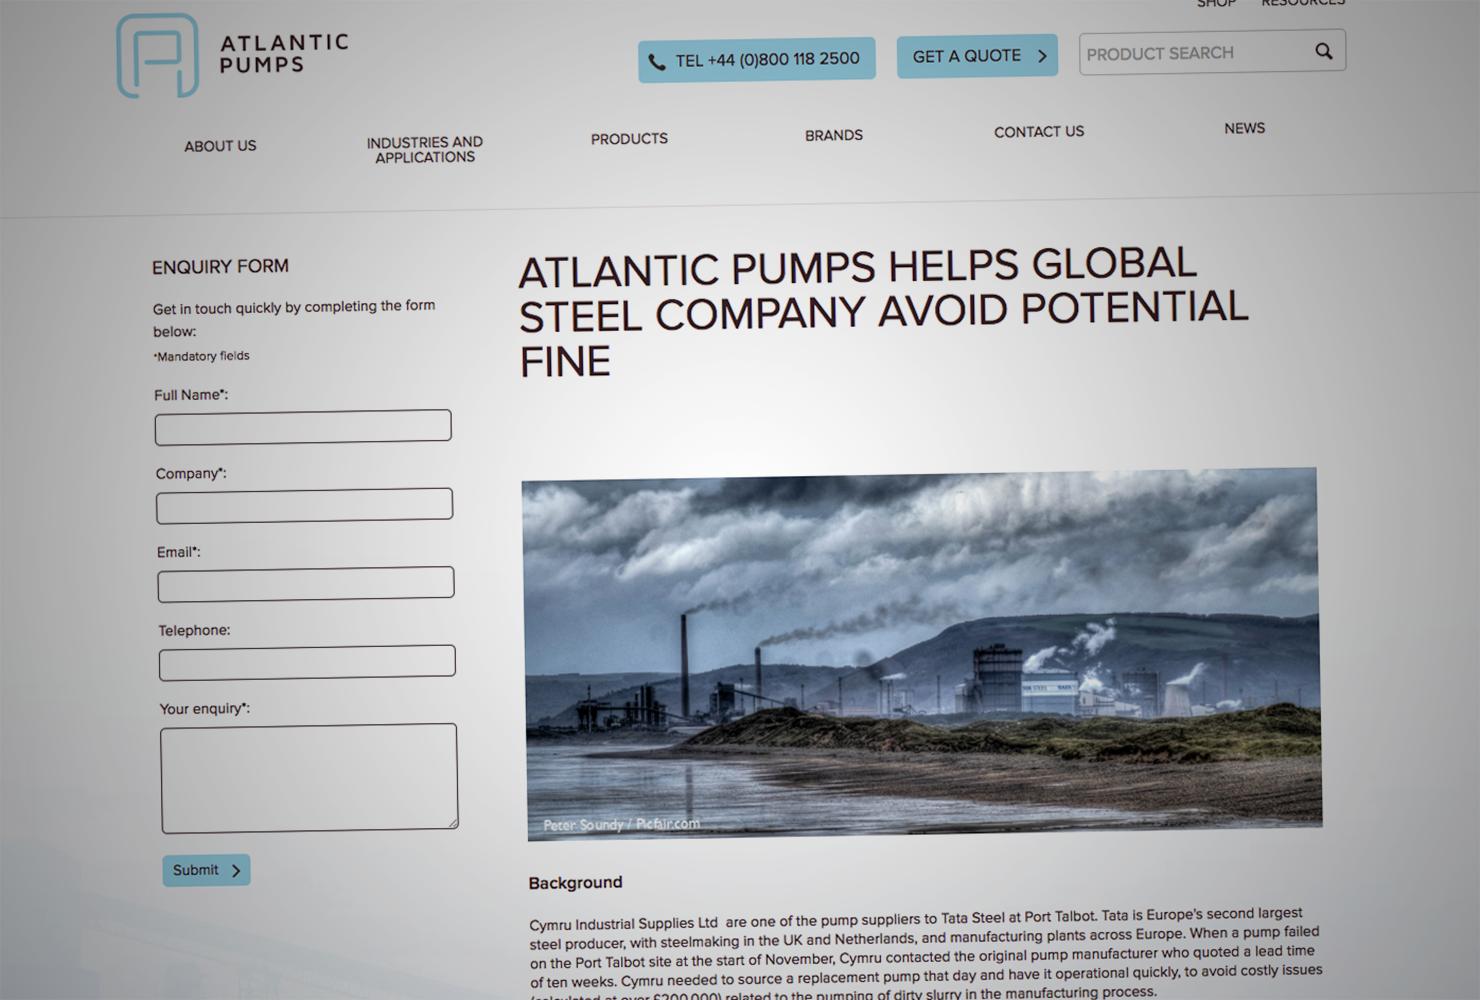 Atlanticpumps